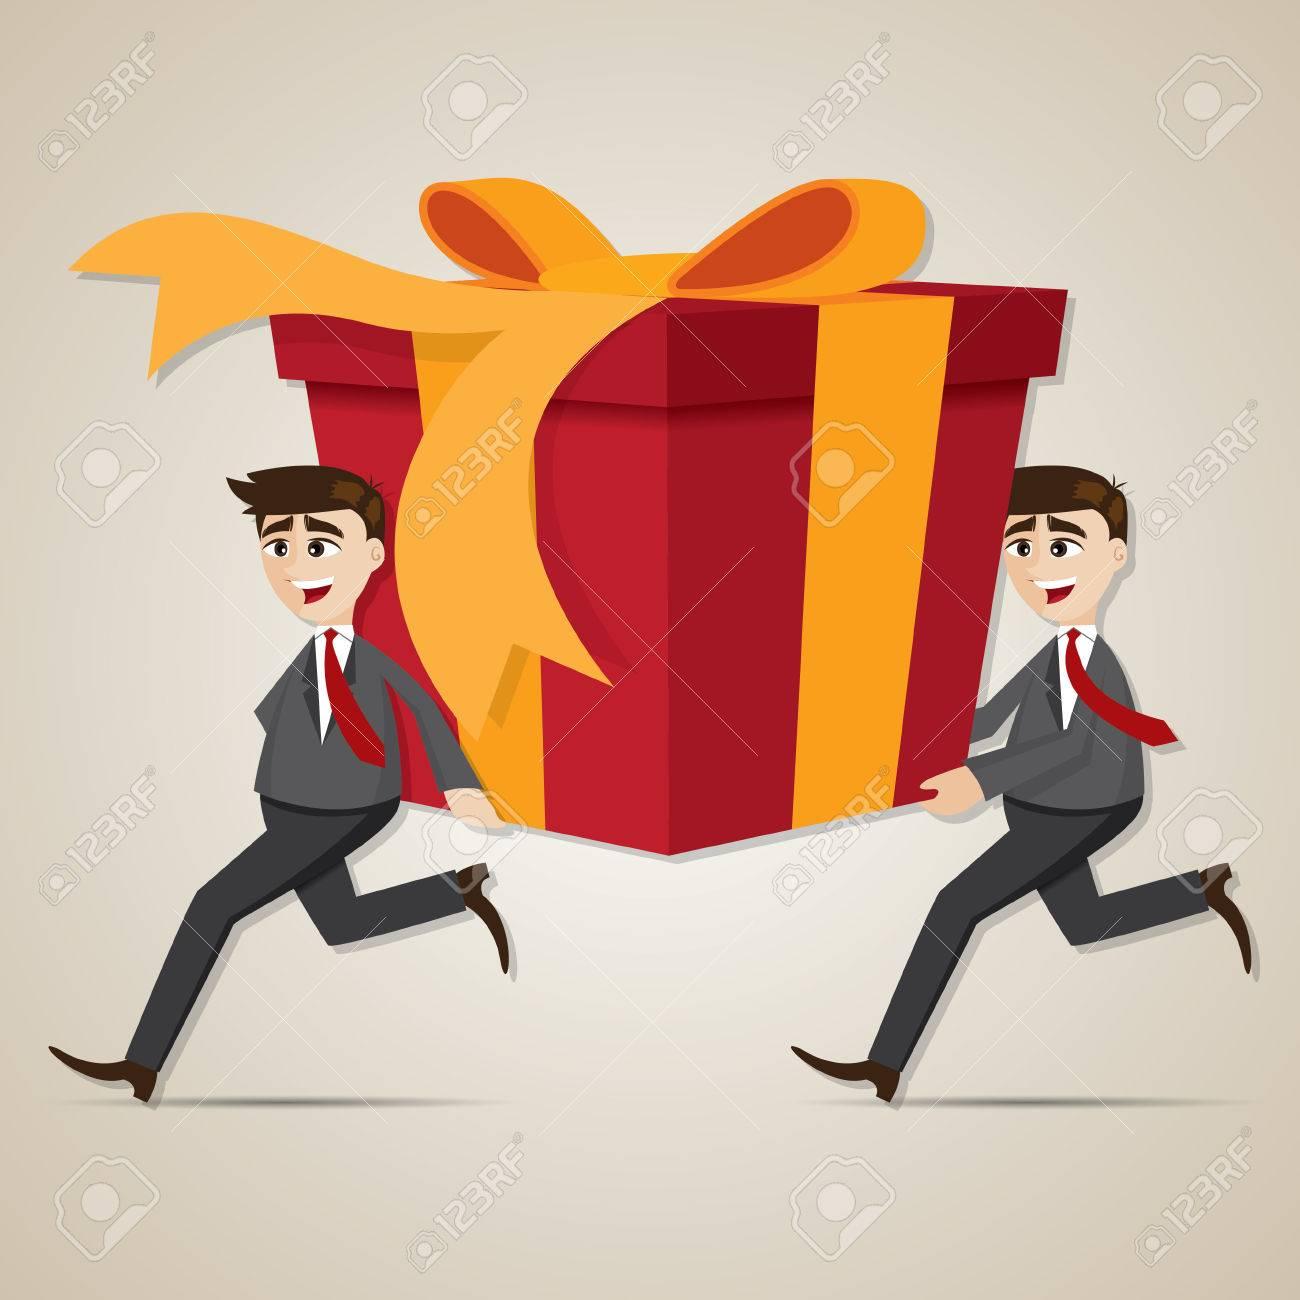 illustration of cartoon businessman carrying big gift box royalty